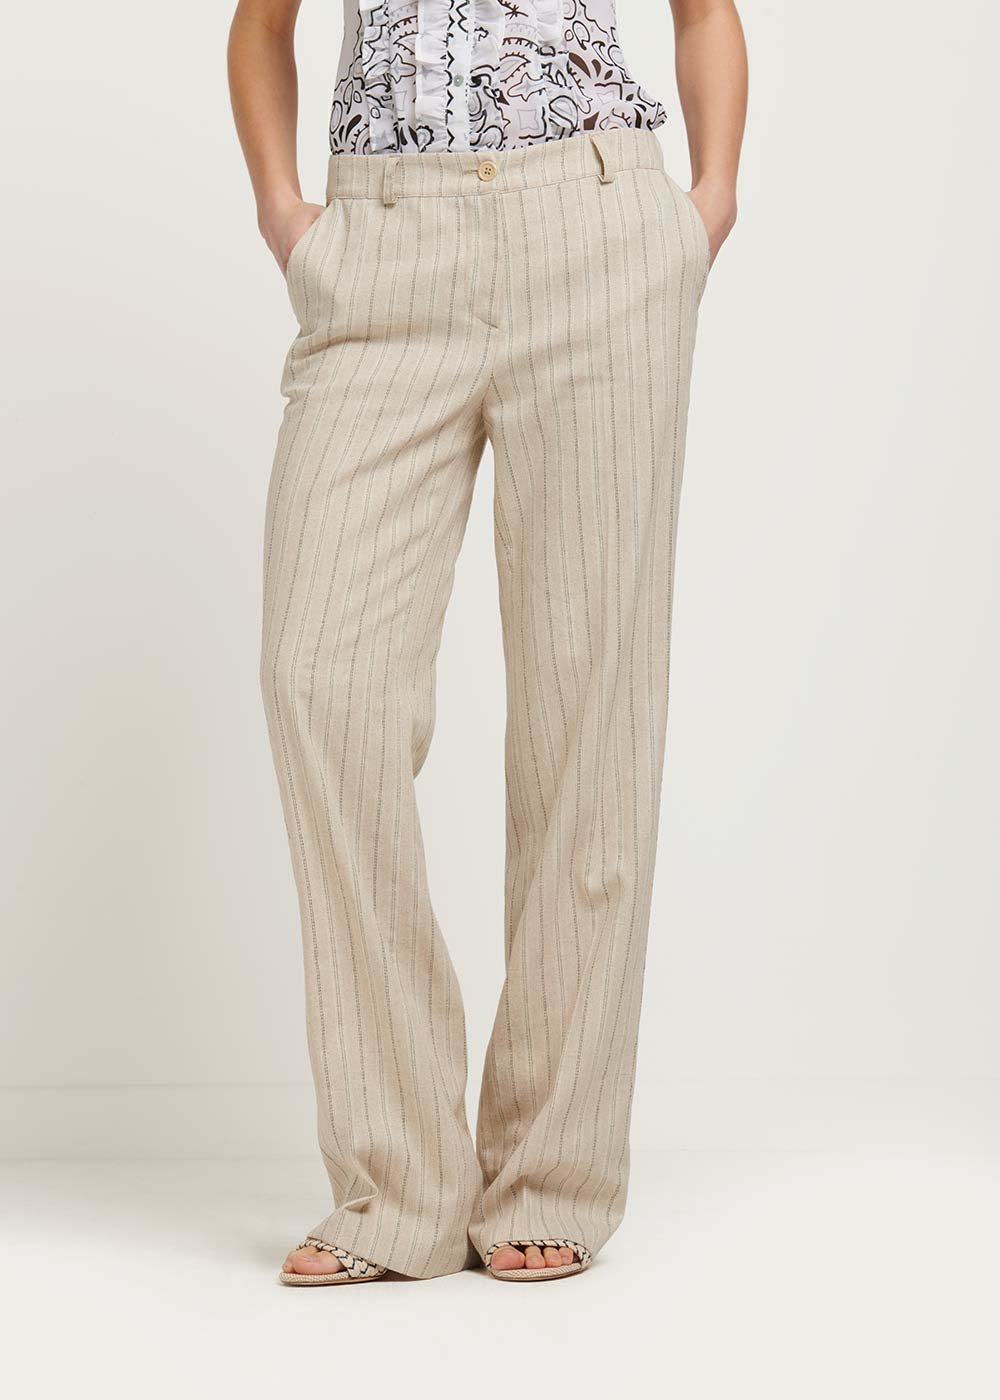 Ashley pinstriped trousers - Beige \ Silver Stripes - Woman